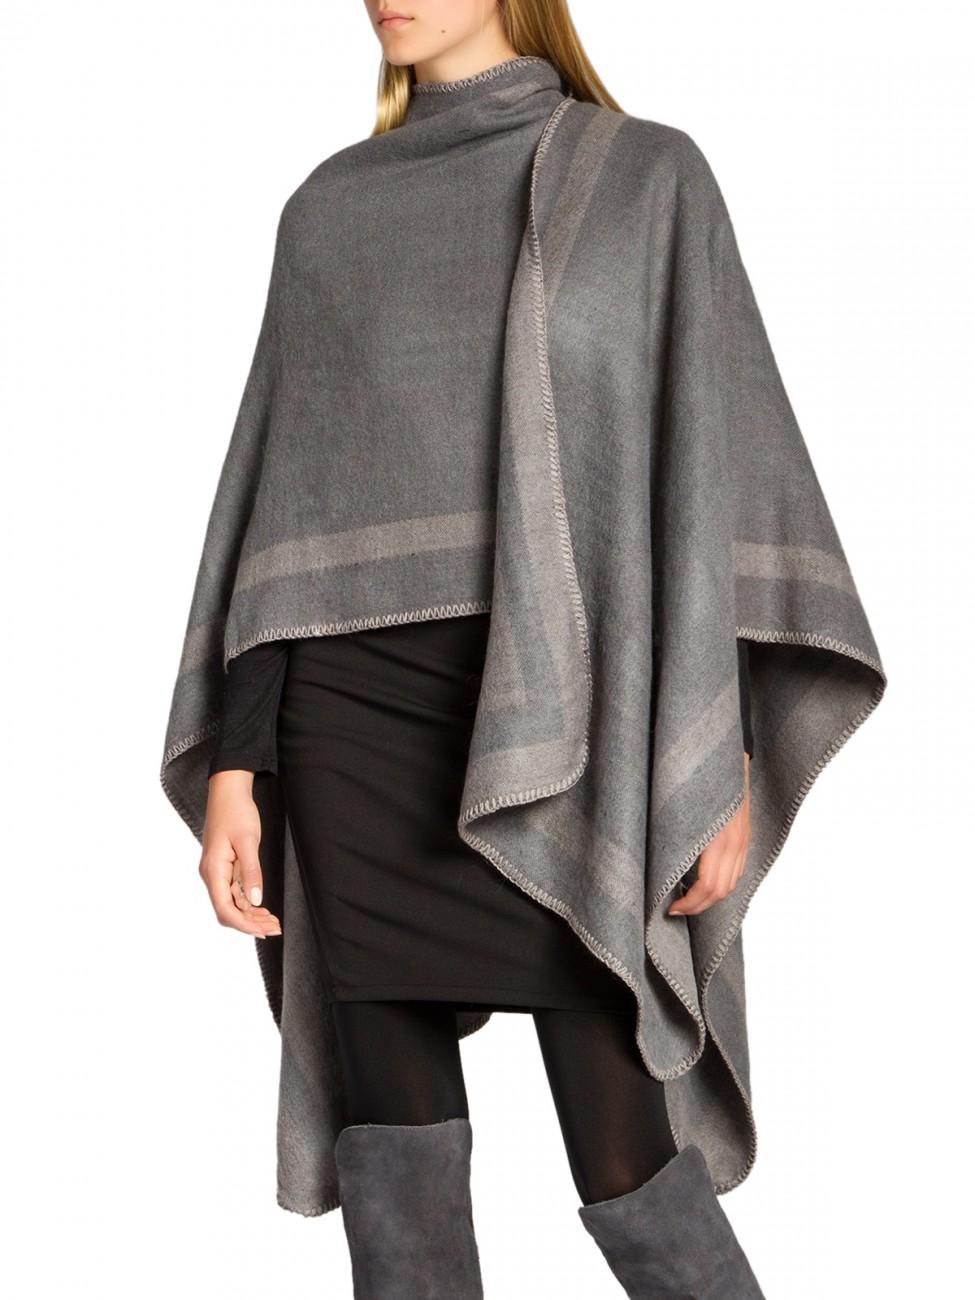 caspar damen wende poncho wolle schwarz cape strick xl. Black Bedroom Furniture Sets. Home Design Ideas